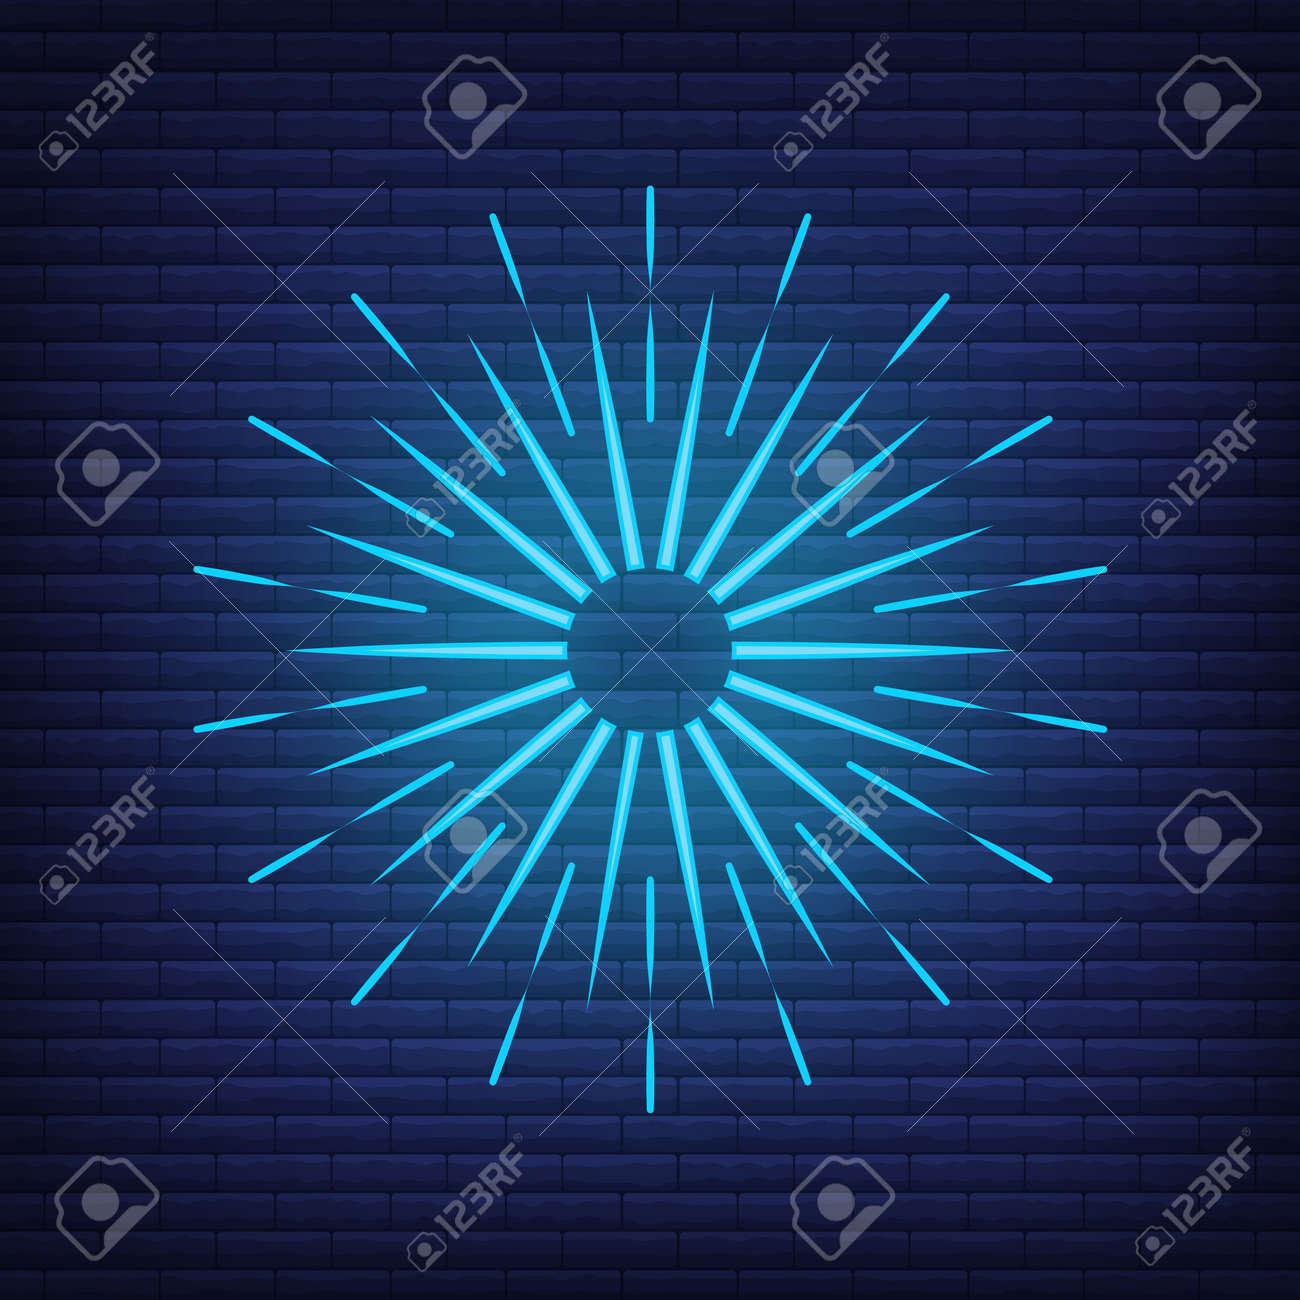 Retro design light sunburst neon style glow geometric shape, vintage rays sunlight explosion icon concept vector illustration, isolated on black wall. Minimal blue firework burst label, sunbeam badge. - 168394844